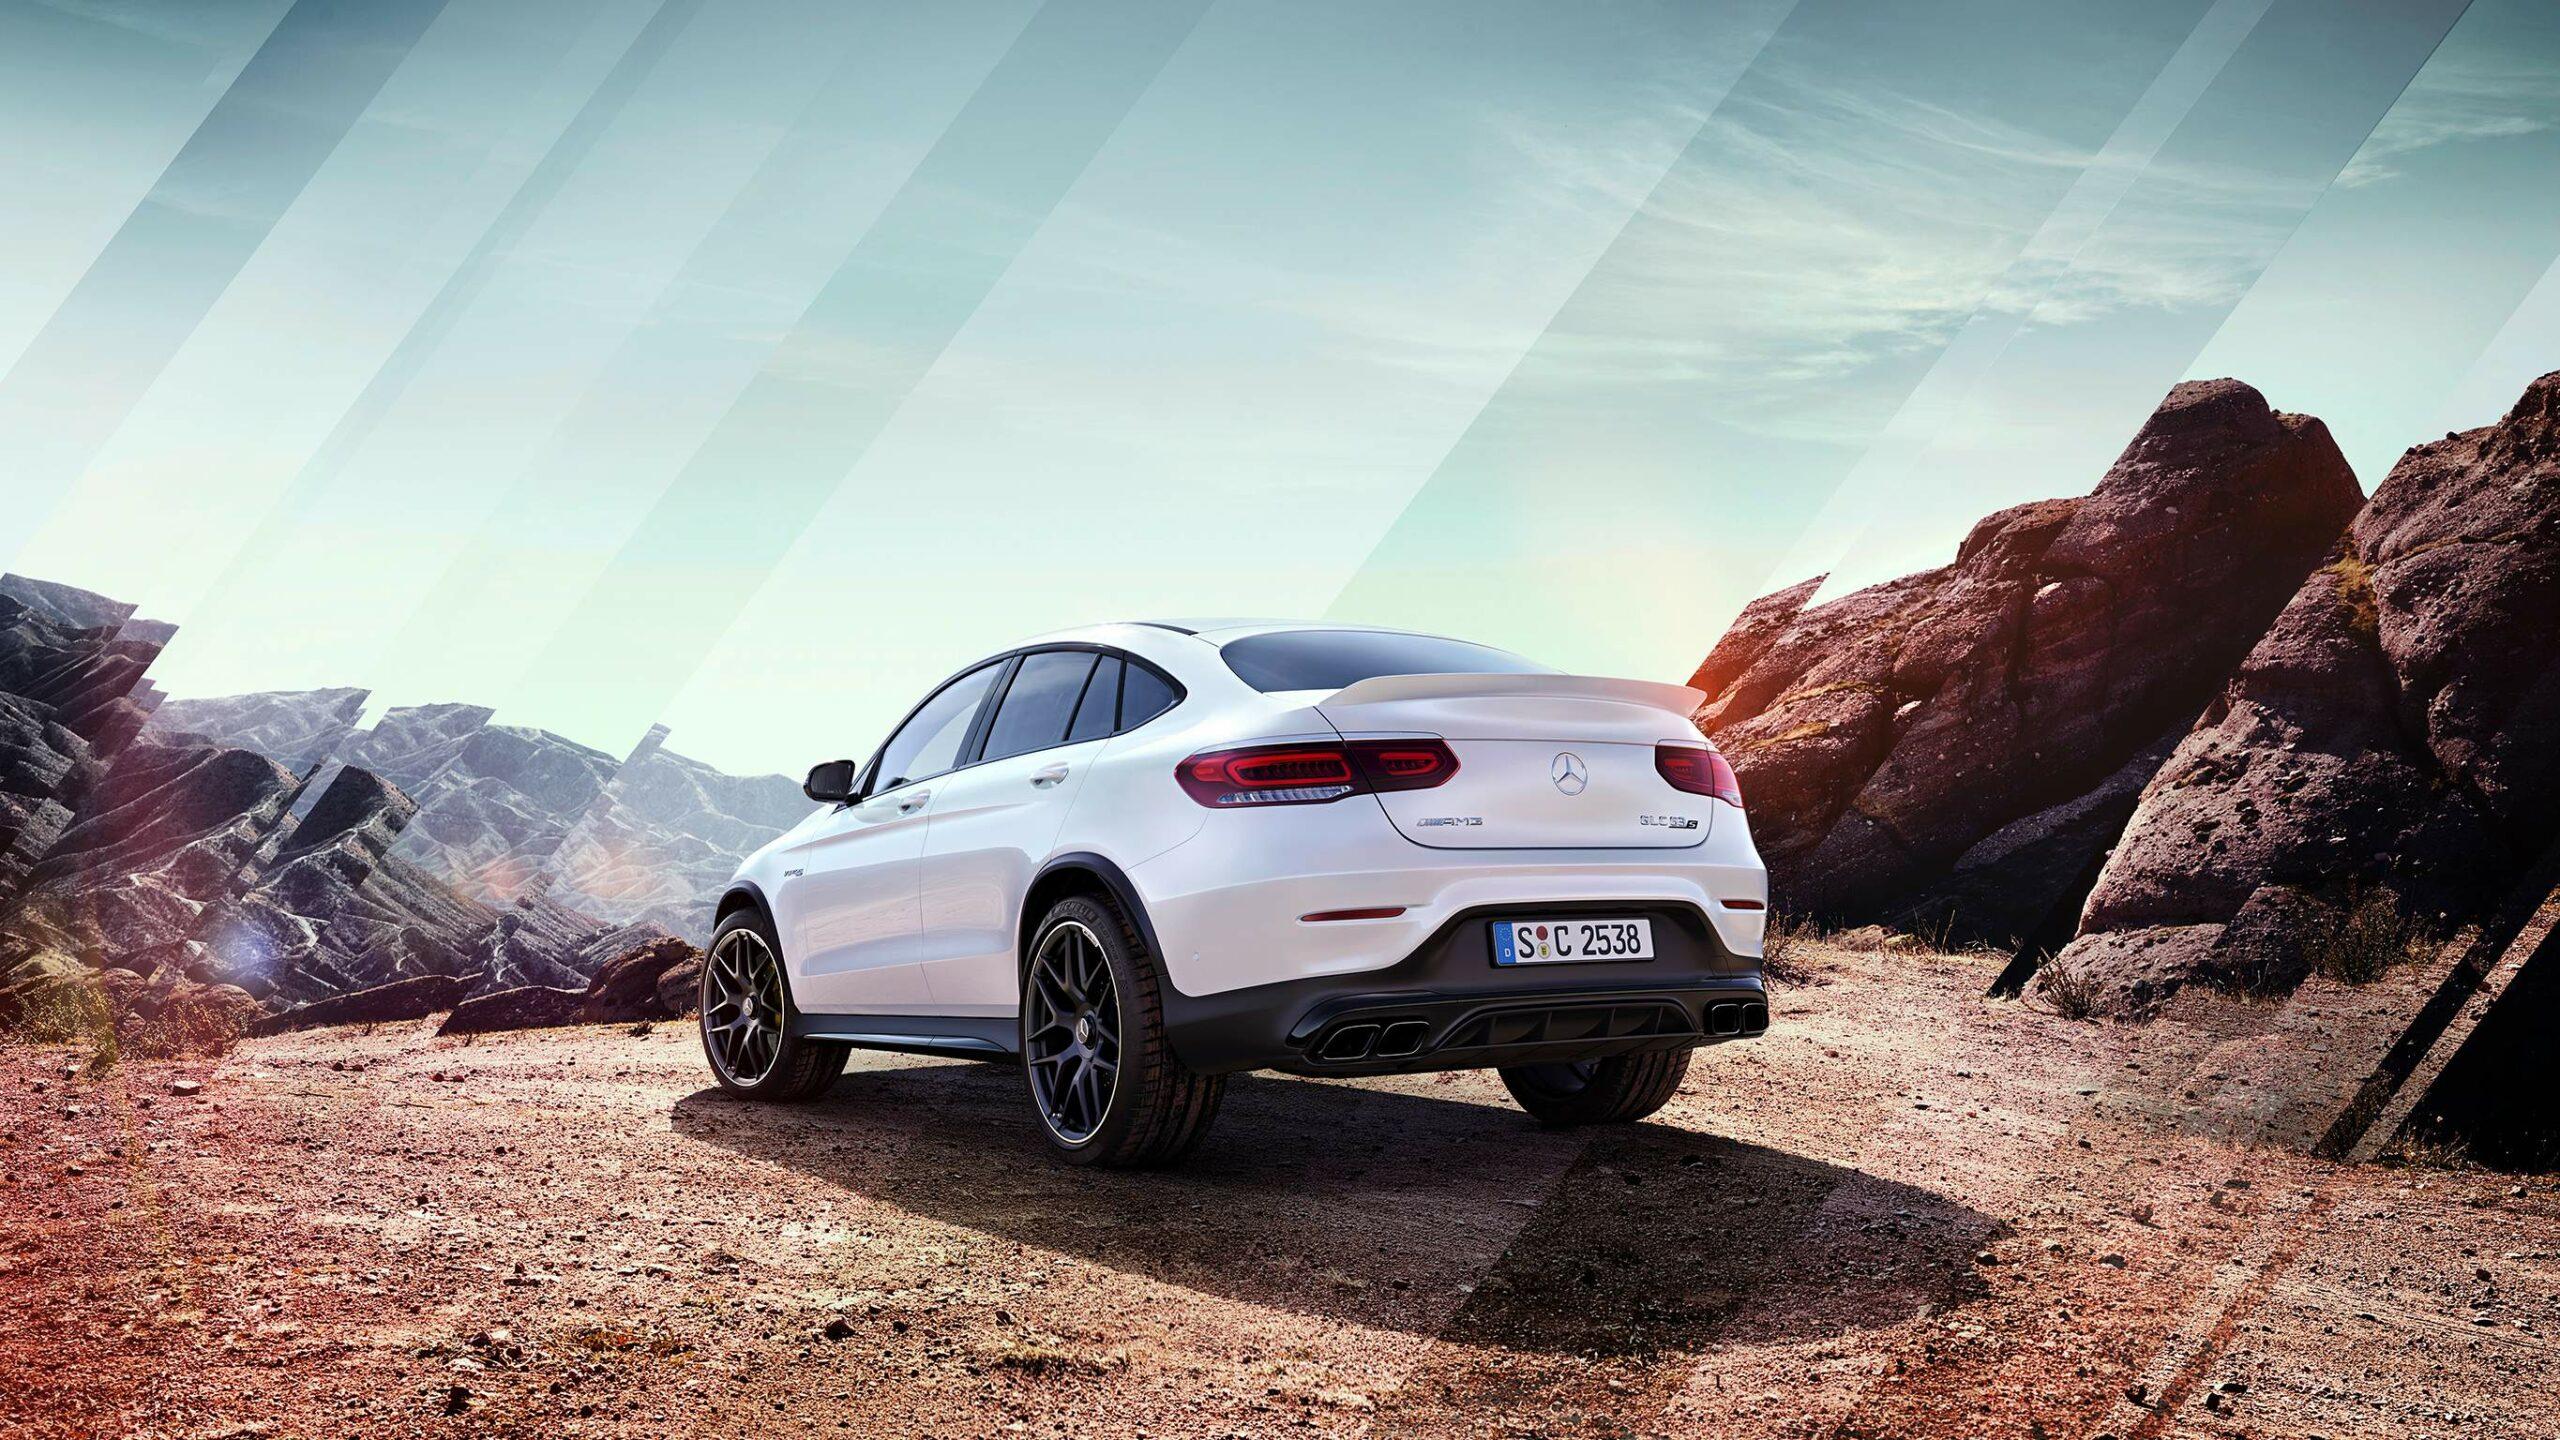 CAR-Avenue-Mercedes-AMG-GLC-Coupe-SUV-02